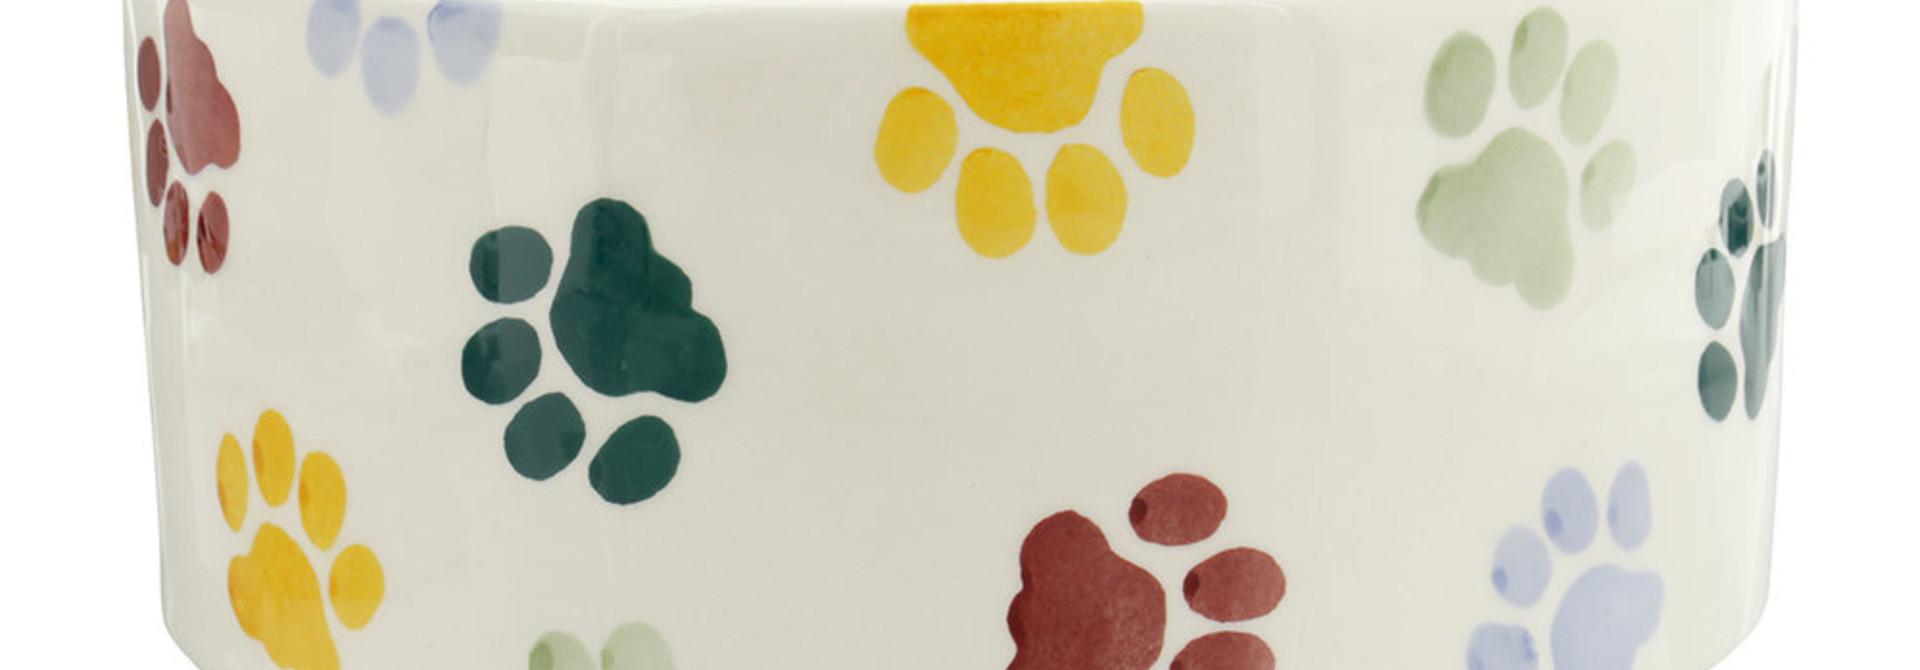 Polka Paws Small Pet Bowl